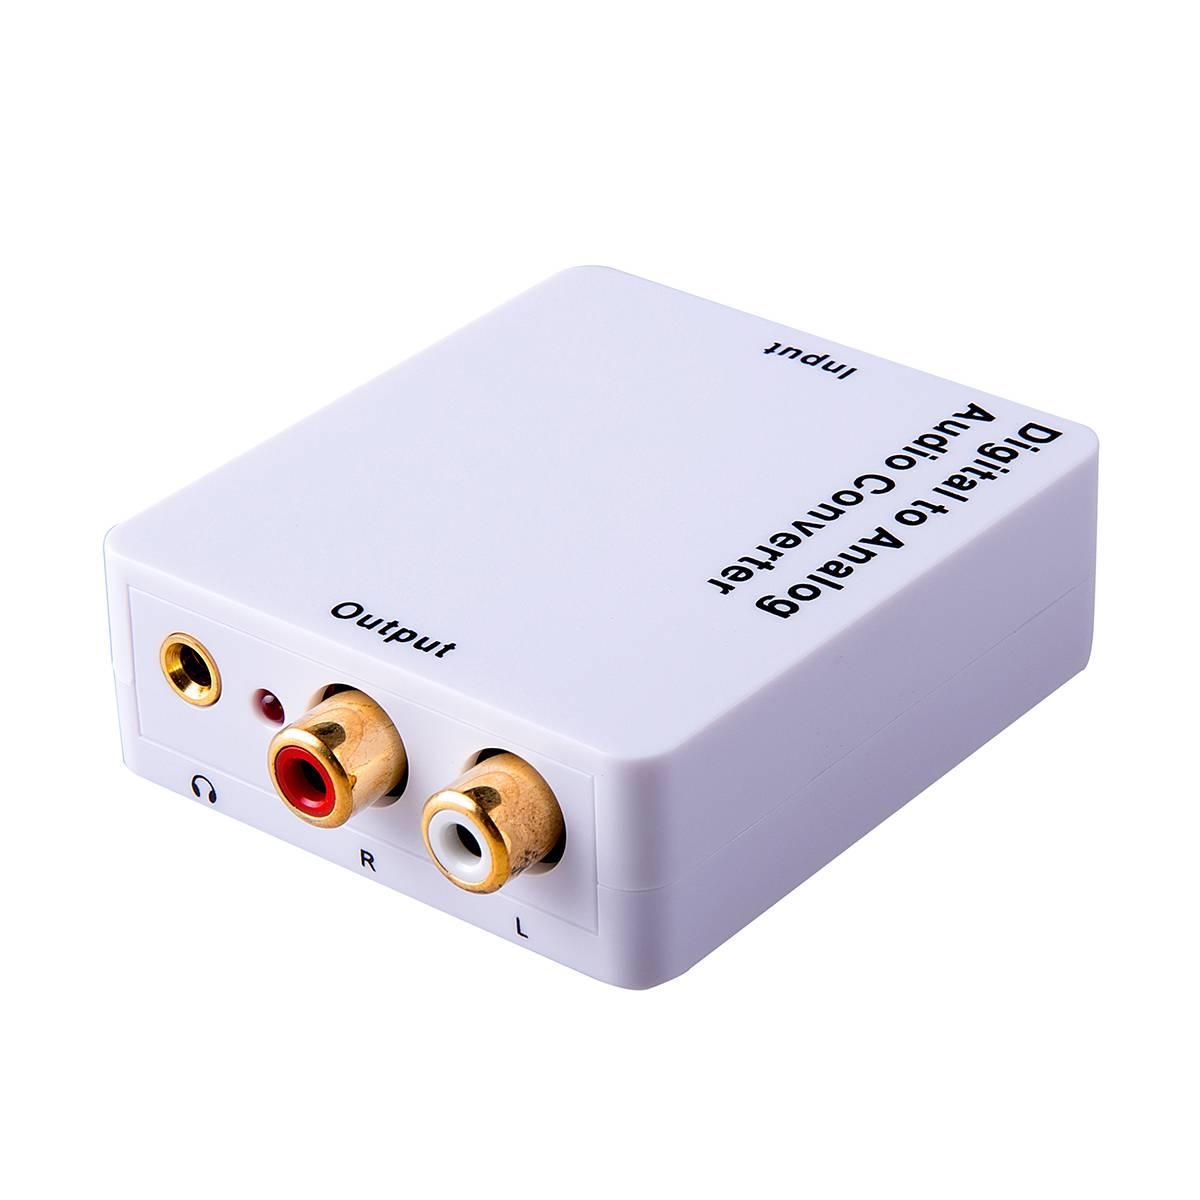 White digital to analog audio converter